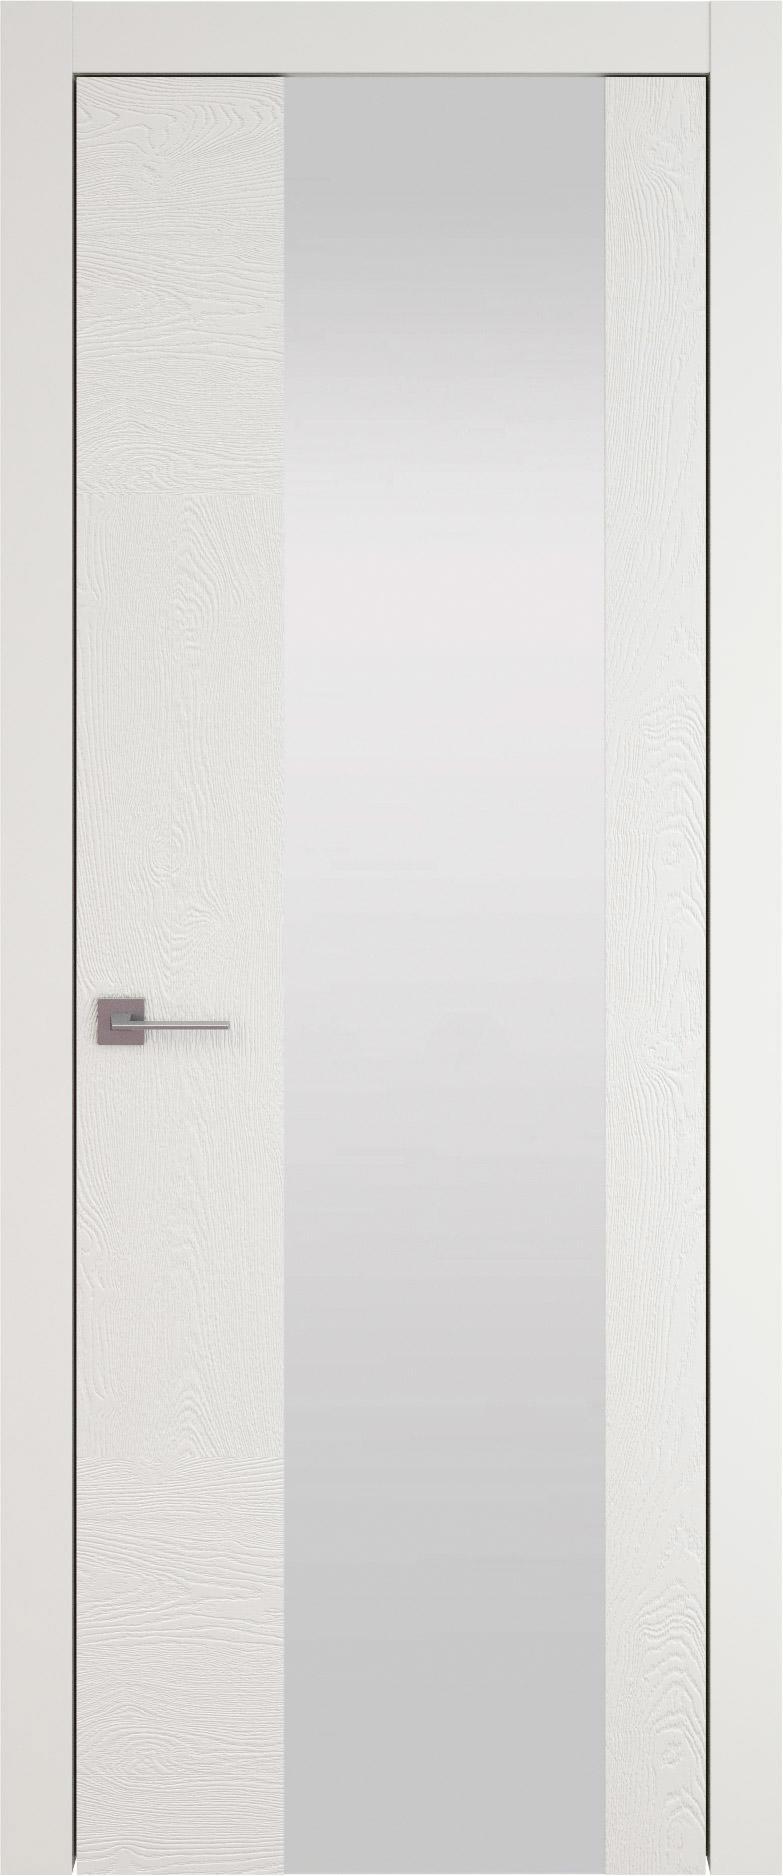 Tivoli Е-1 цвет - Бежевая эмаль по шпону (RAL 9010) Со стеклом (ДО)